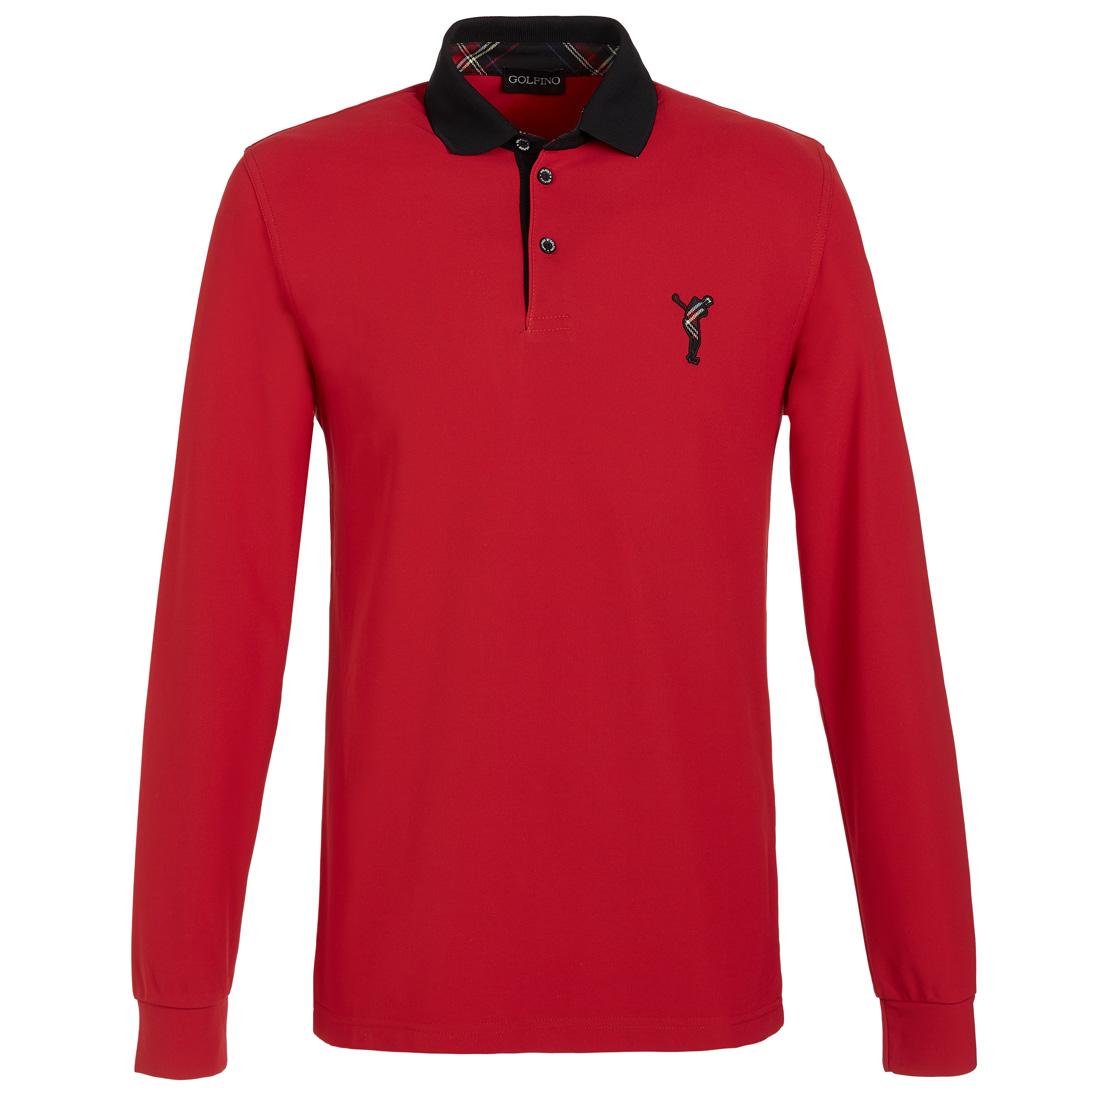 Premium Langarm Funktions-Golfpolo mit Moisture Management